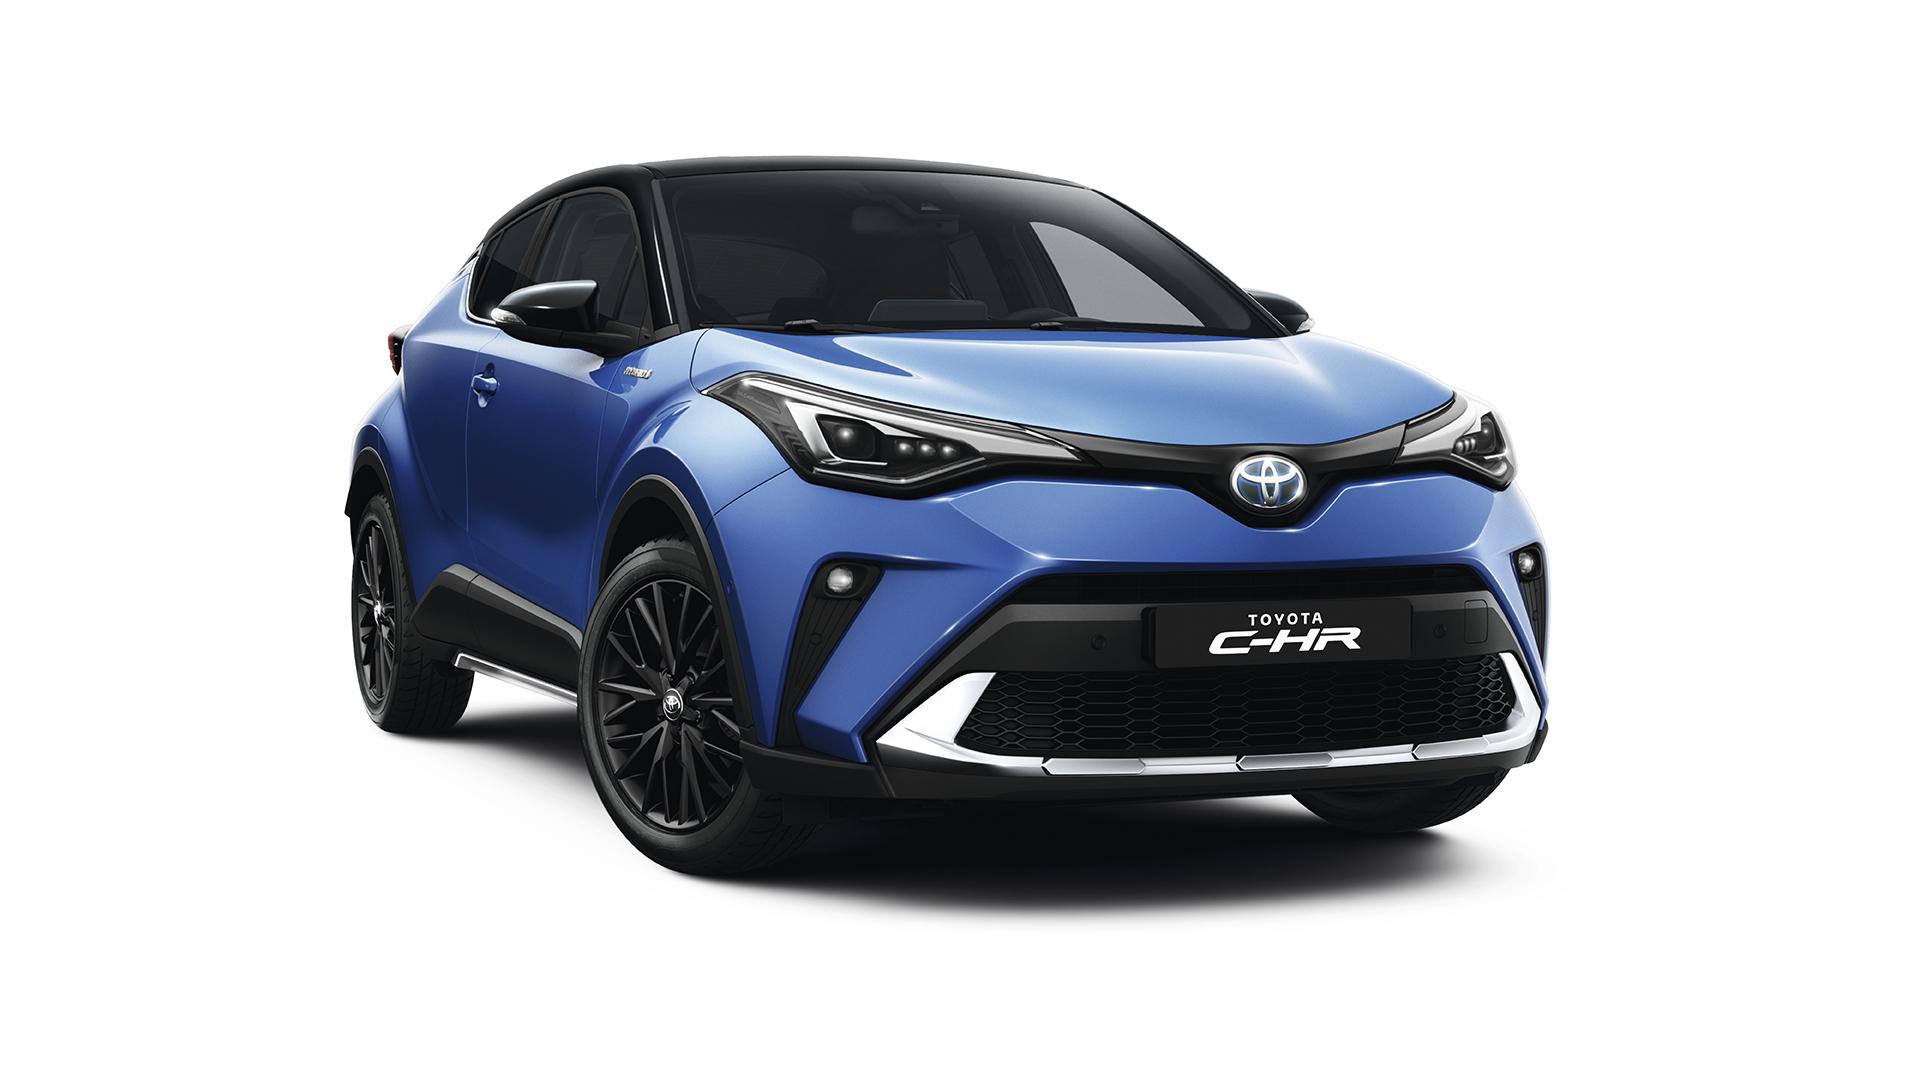 Toyota-c-hr-2019-gallery-010-full tcm-22-1776351